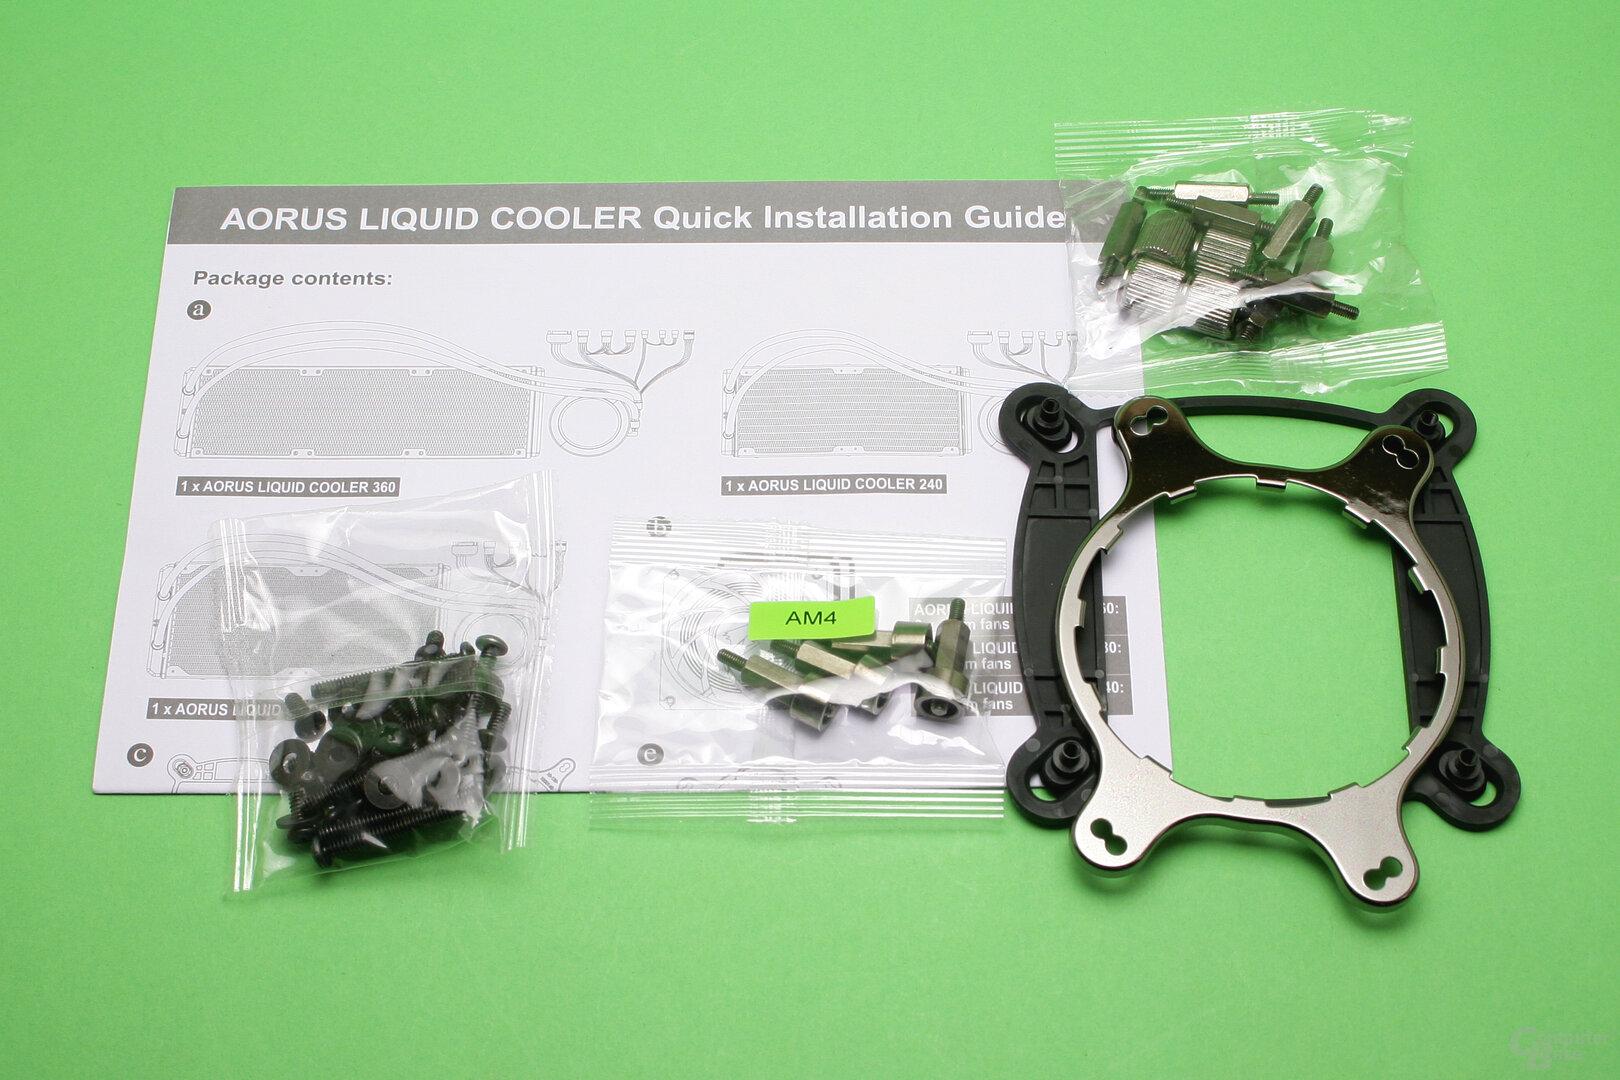 Aorus Liquid Cooler 280: Lieferumfang